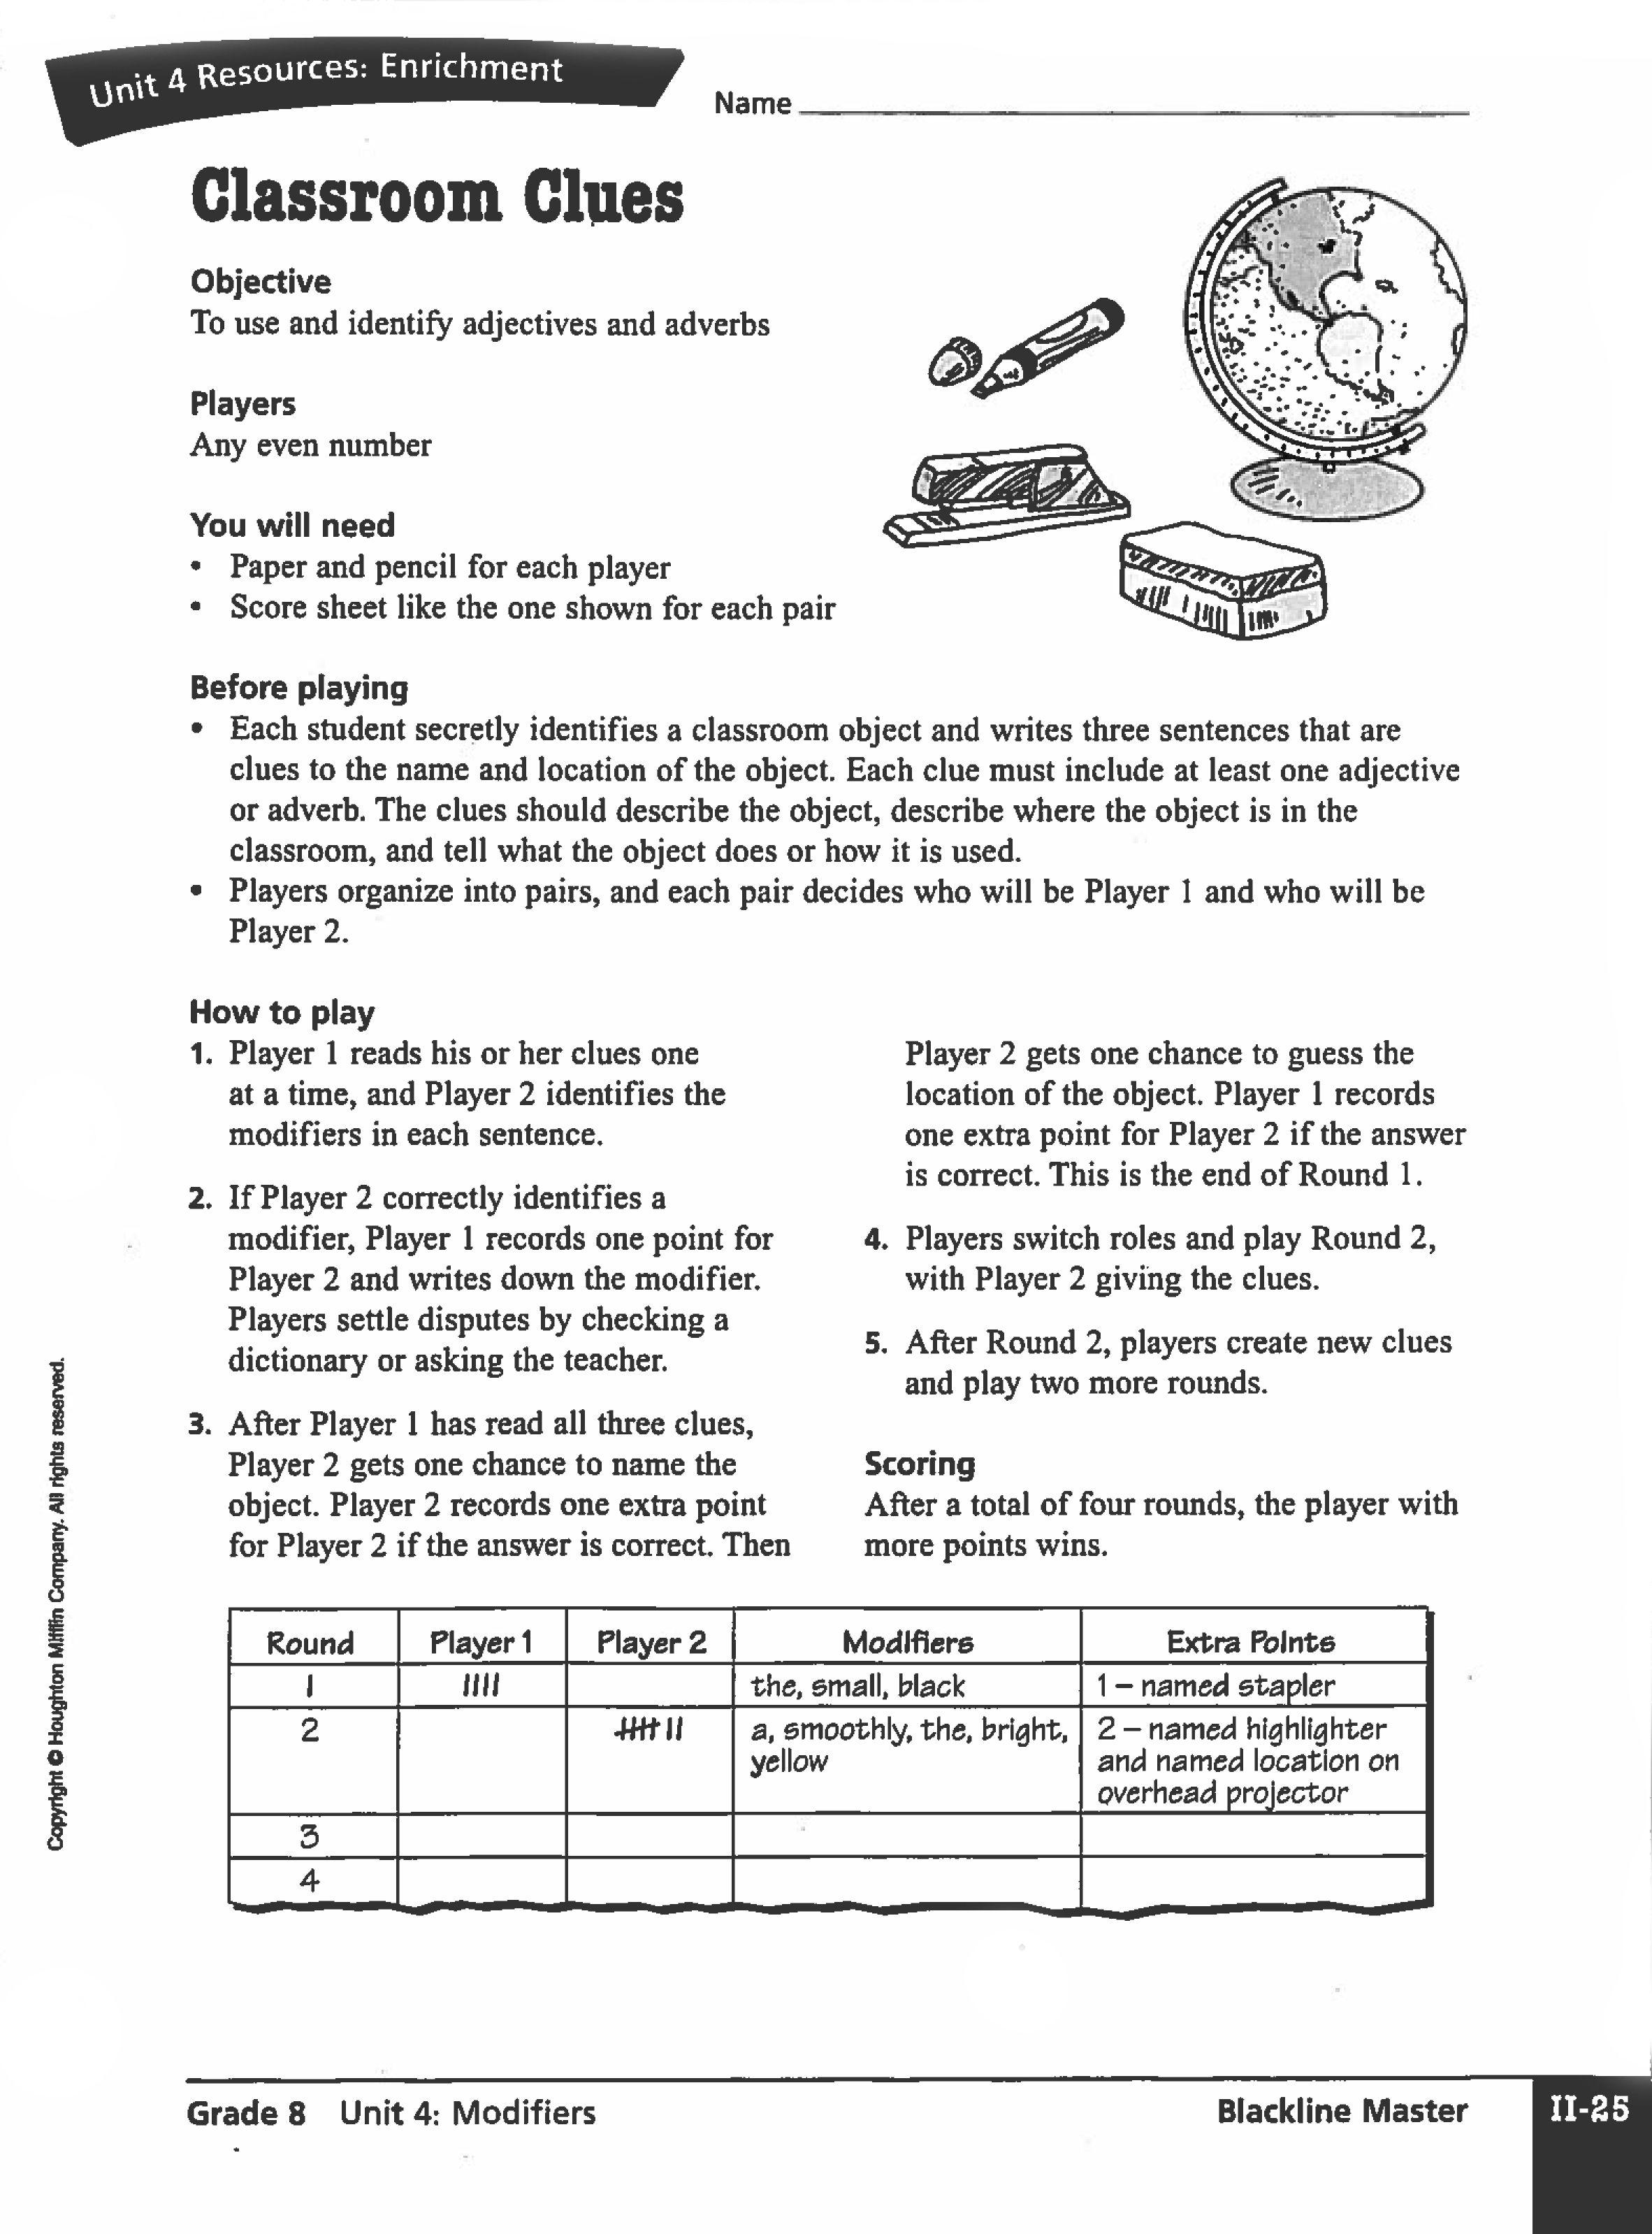 Download This Fun Grammar Printable For Grammar Practice